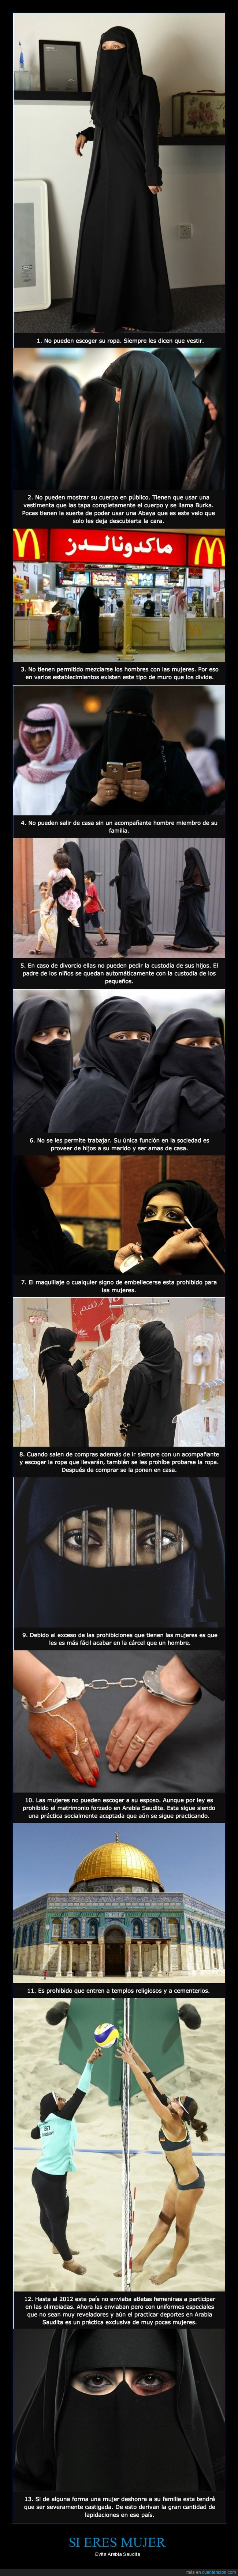 arabia saudita,prohibiciones,siglo XXI,wtf